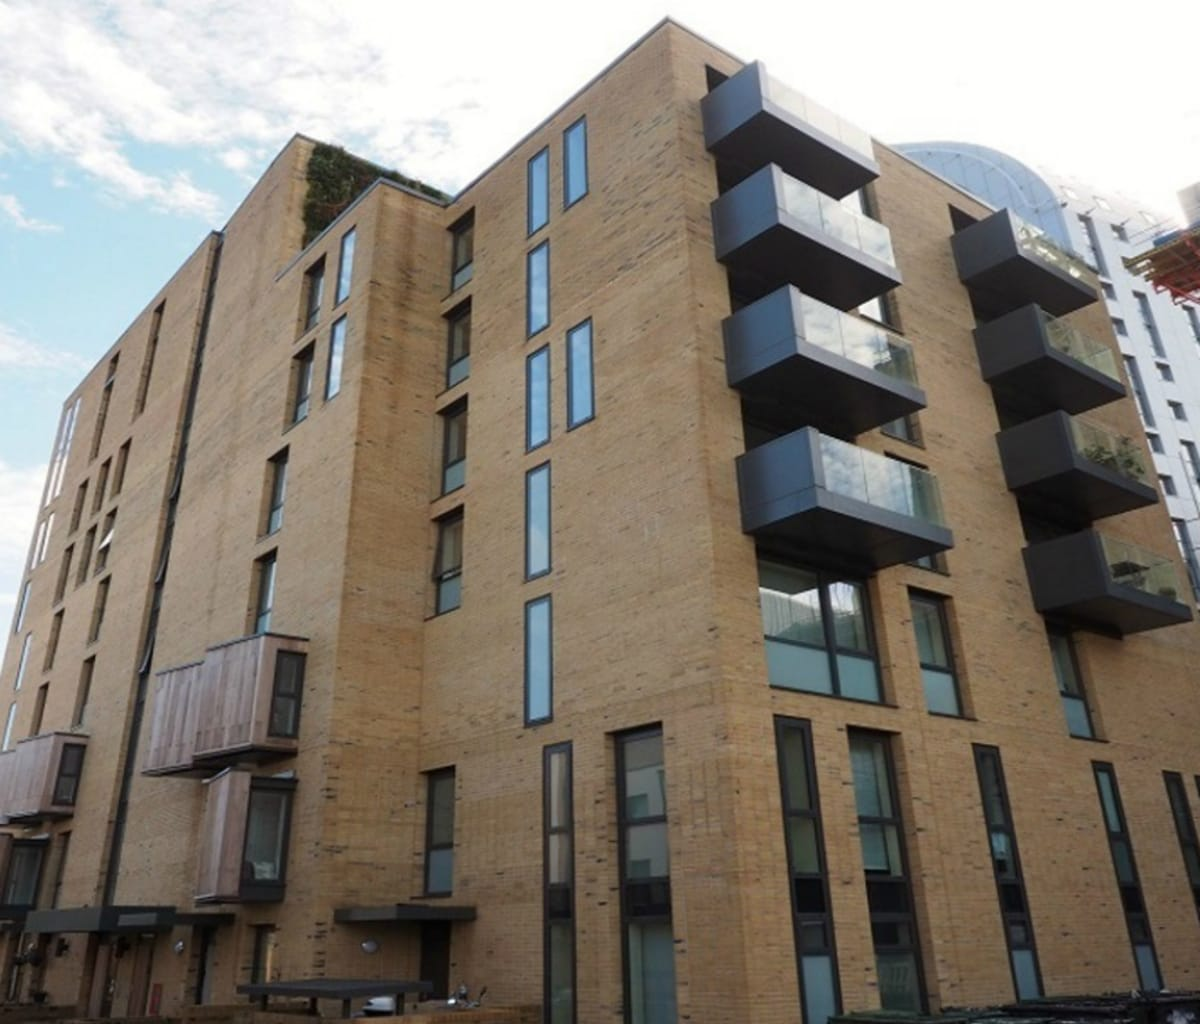 Social housing apartment block in Ealing built using Marshalls' bricks